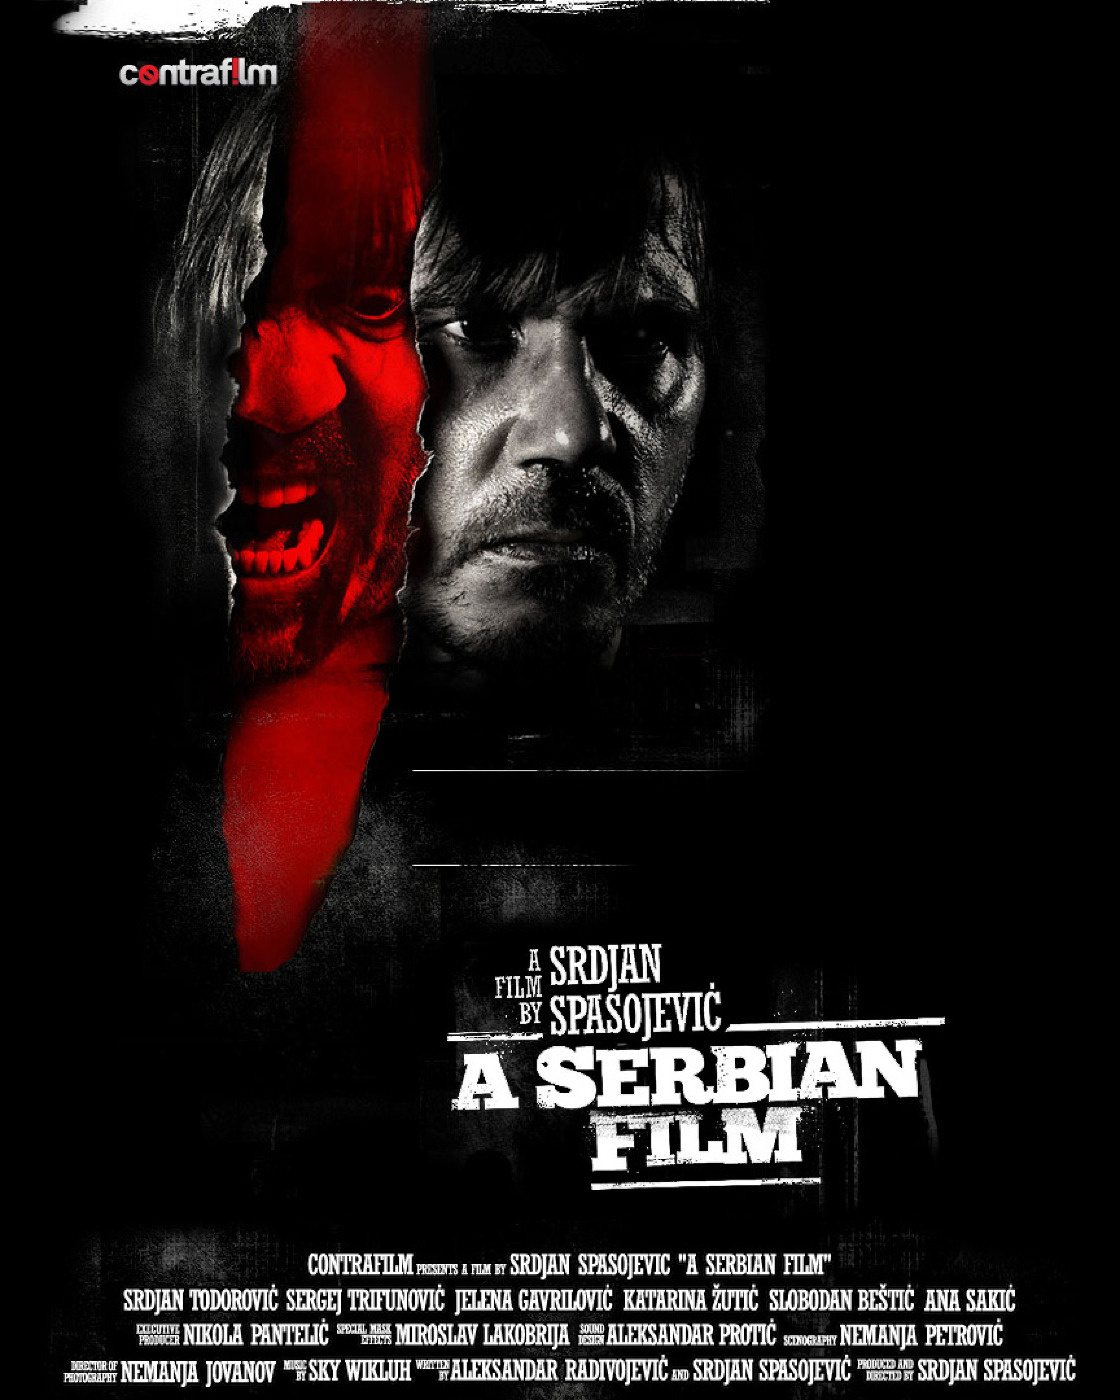 A Serbian Film Porno a serbian film (2010)   horror and alternative cinema reviews